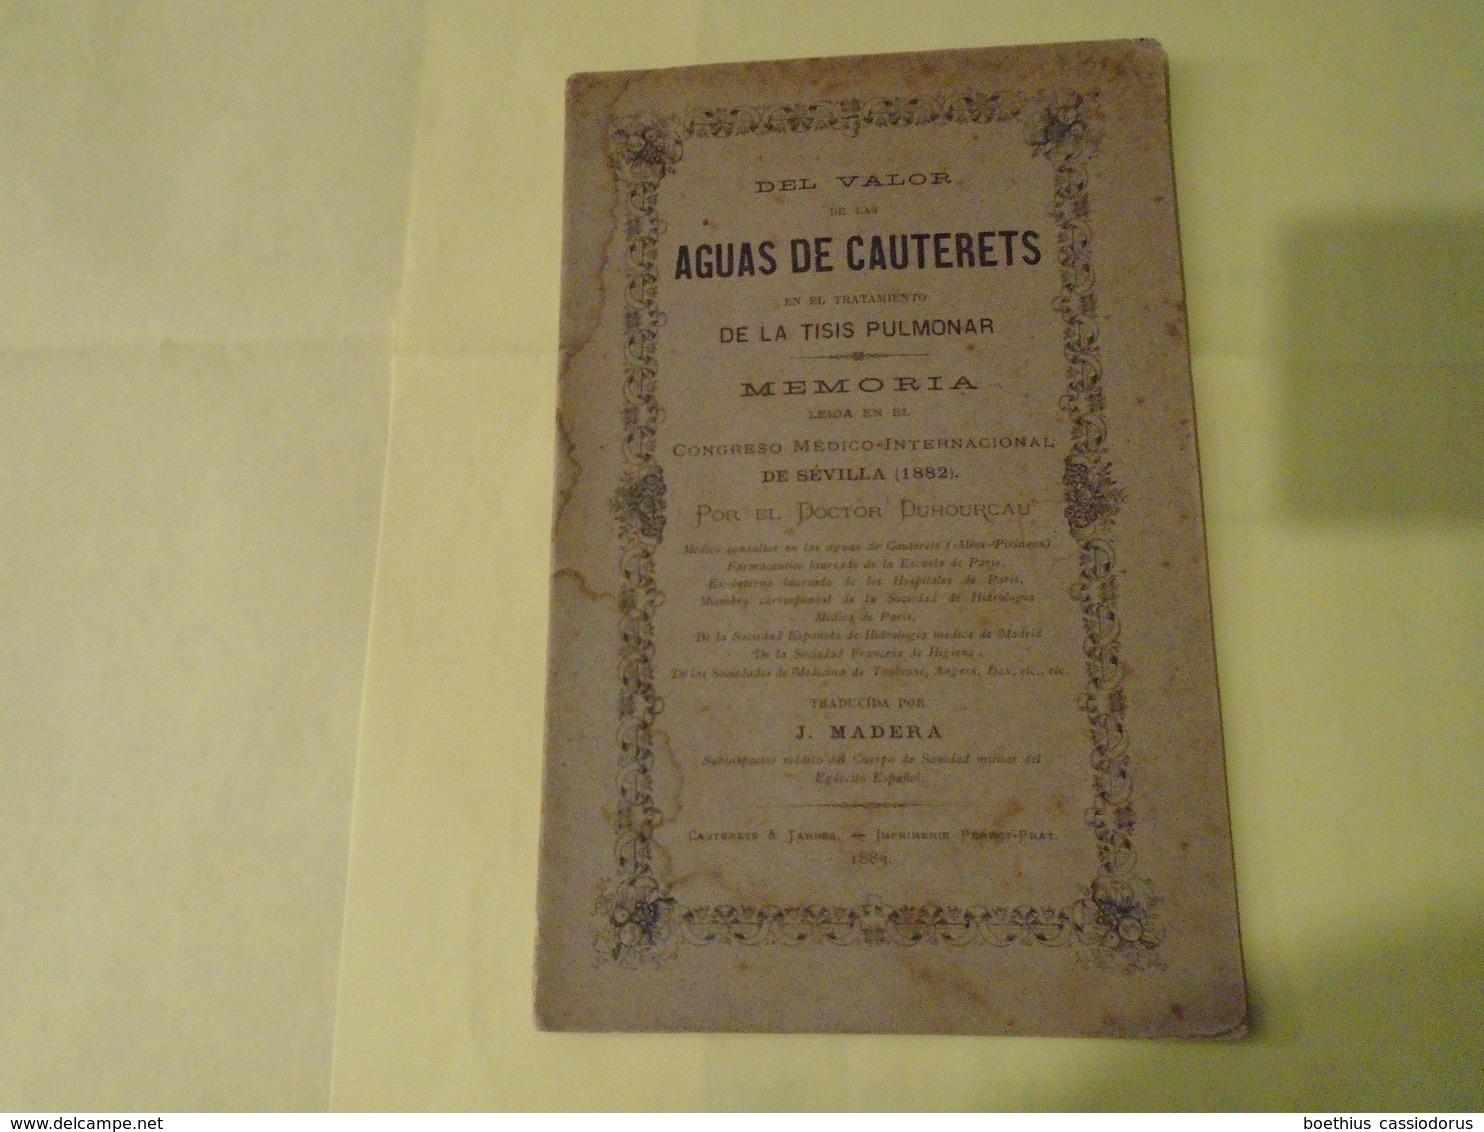 Pirineos Pyrénées : VALOR DE LAS AGUAS DE CAUTERETS EN EL TRATAMIENTO DE LA TISIS PULMONAR 1883 Dr DUHOURCAU - Ontwikkeling